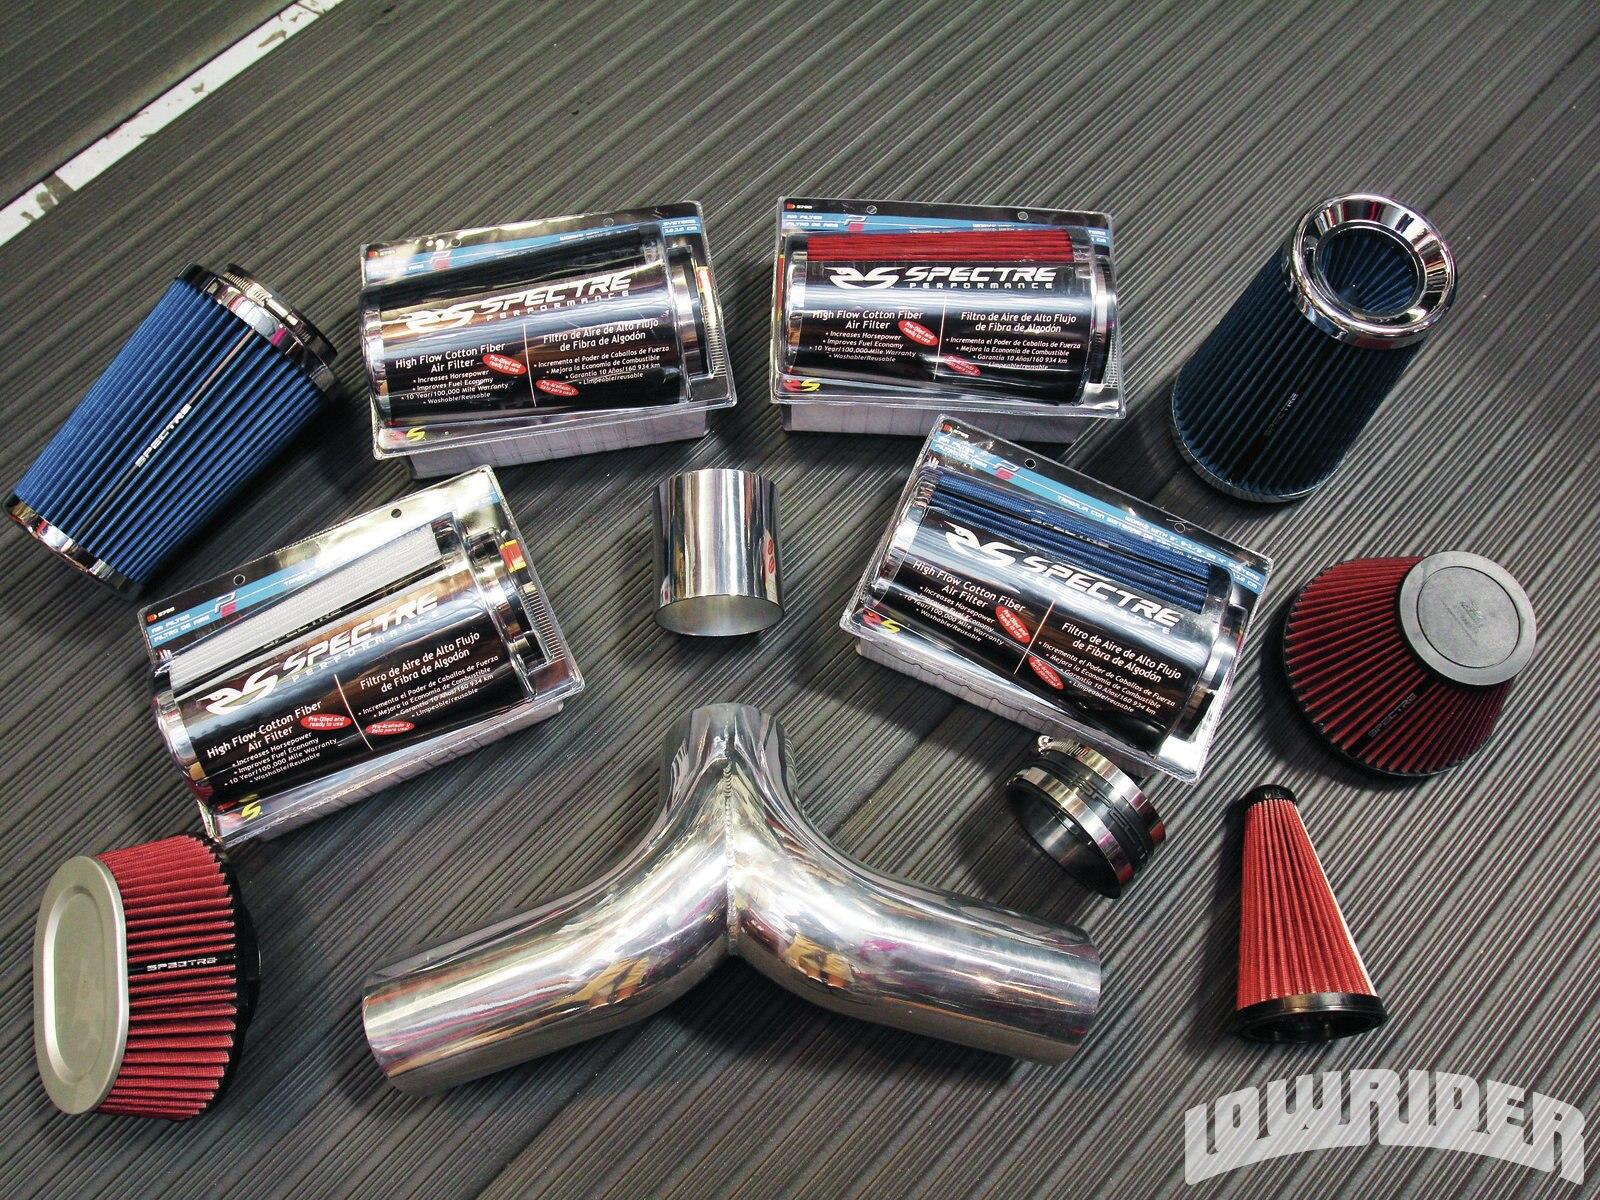 lrmp-1111-02-o-spectre-air-intake-system-parts2